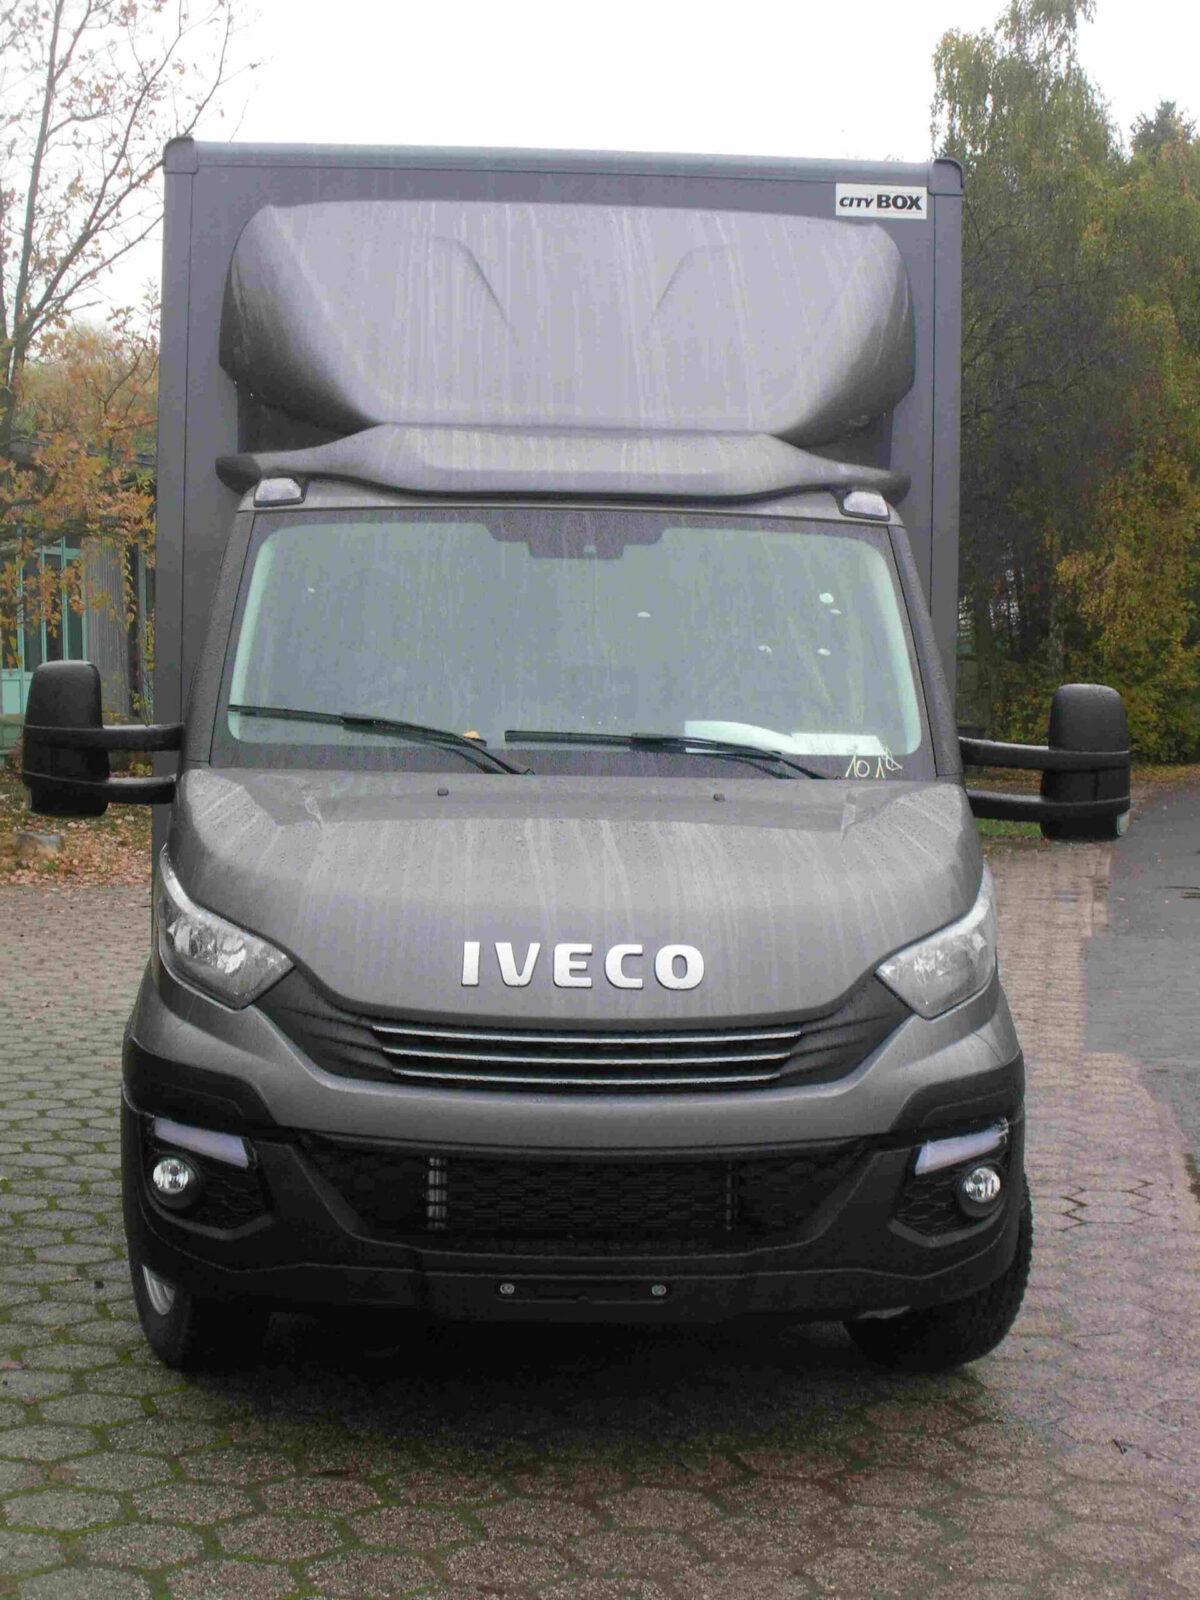 ECONOMY 3D-Dachspoiler für Iveco Daily, Normalfahrerhaus B 2000 x H 650-850 mm für abc aeroline